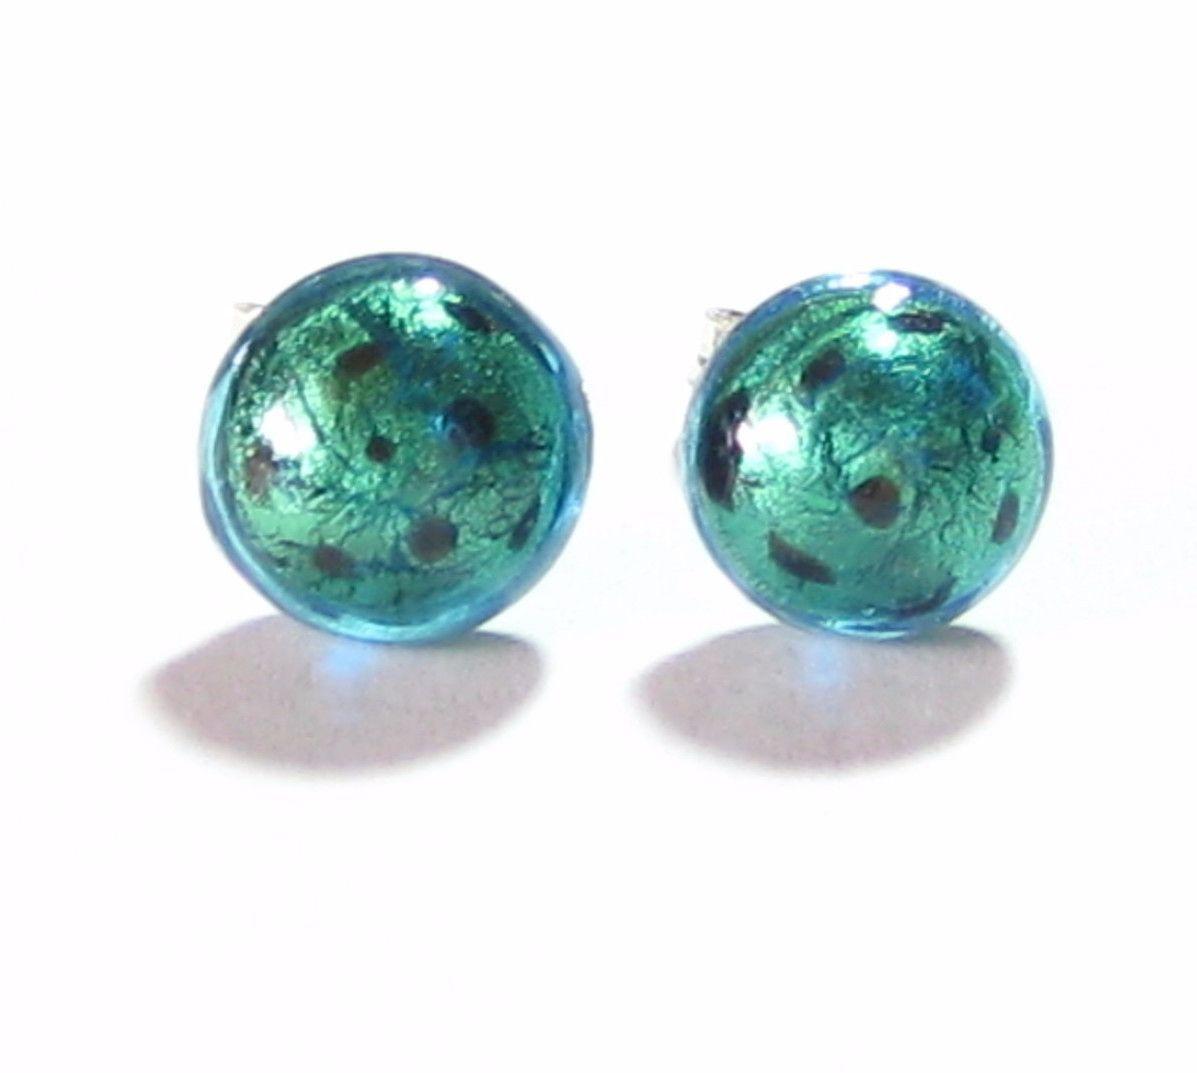 Murano Glass Leopard Aqua Green Button Sterling silver Earrings, Studs